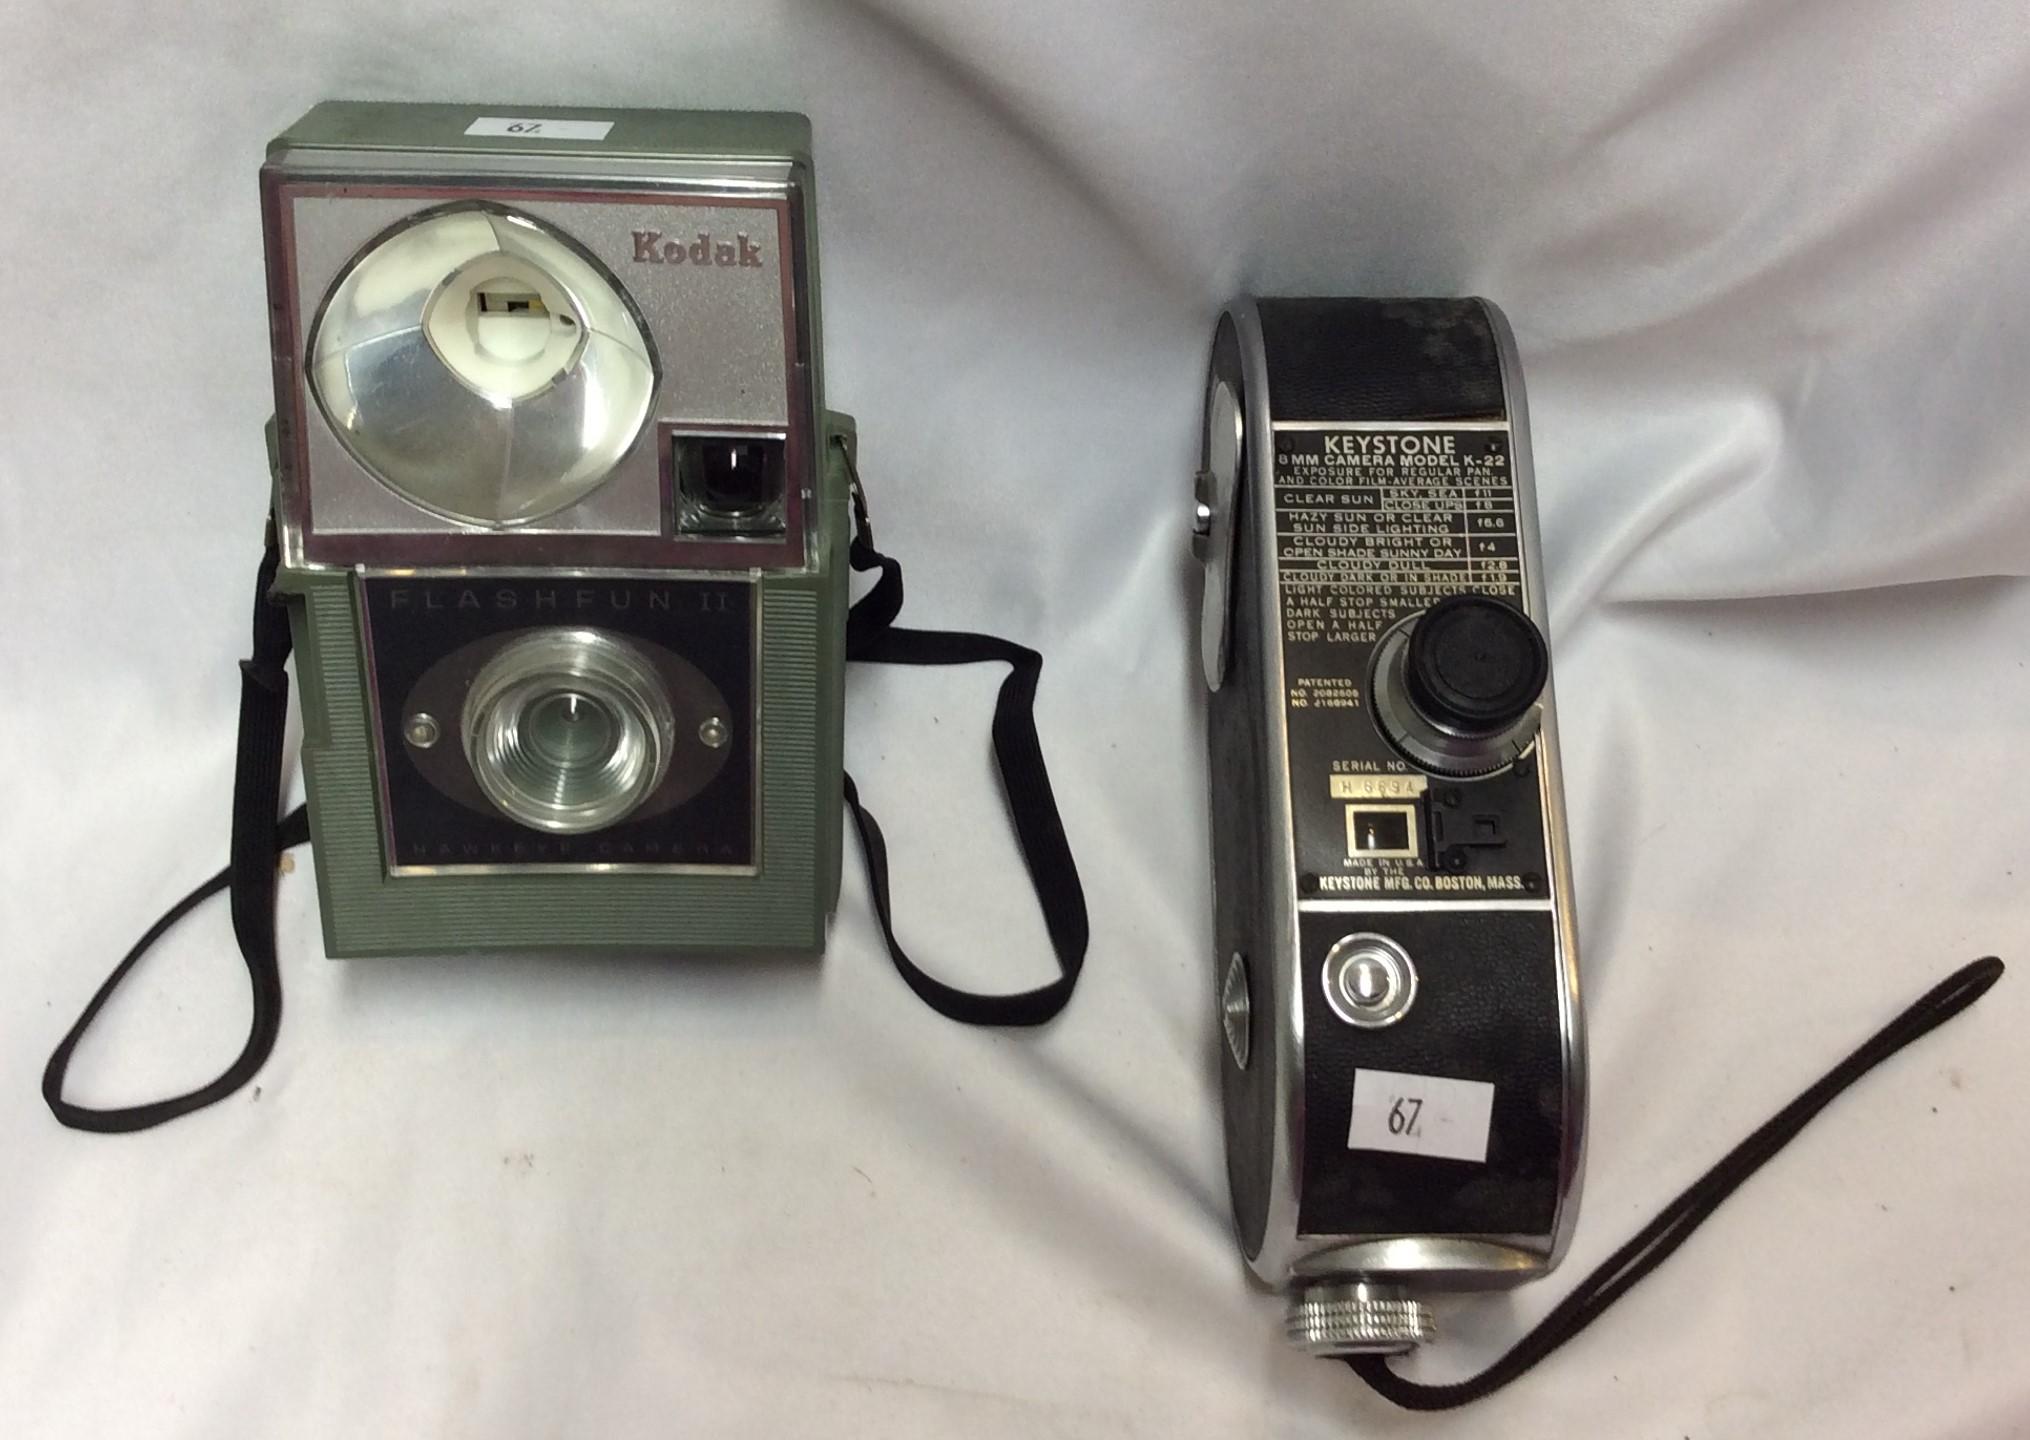 8Mm Vintage Camera keystone 8mm camera model no. k-22 and kodak flashfun ii